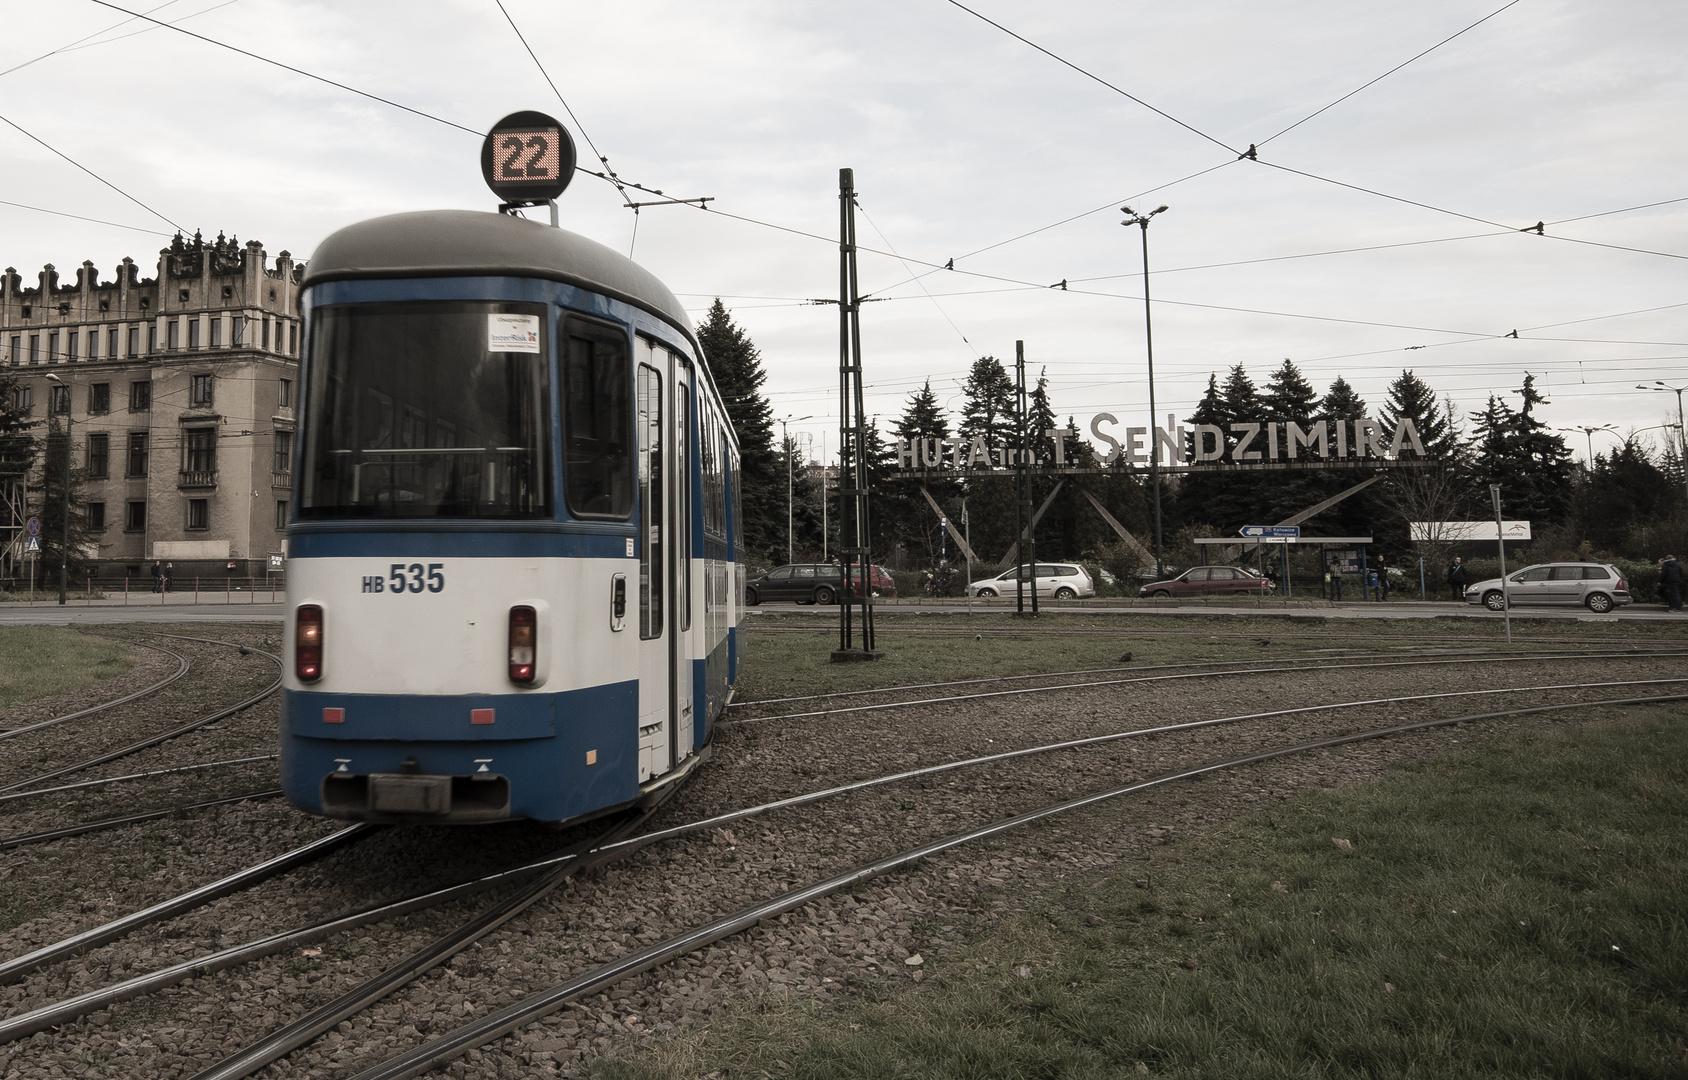 Krakow - Nowa Huta - Aleja Solidarnosci - 03